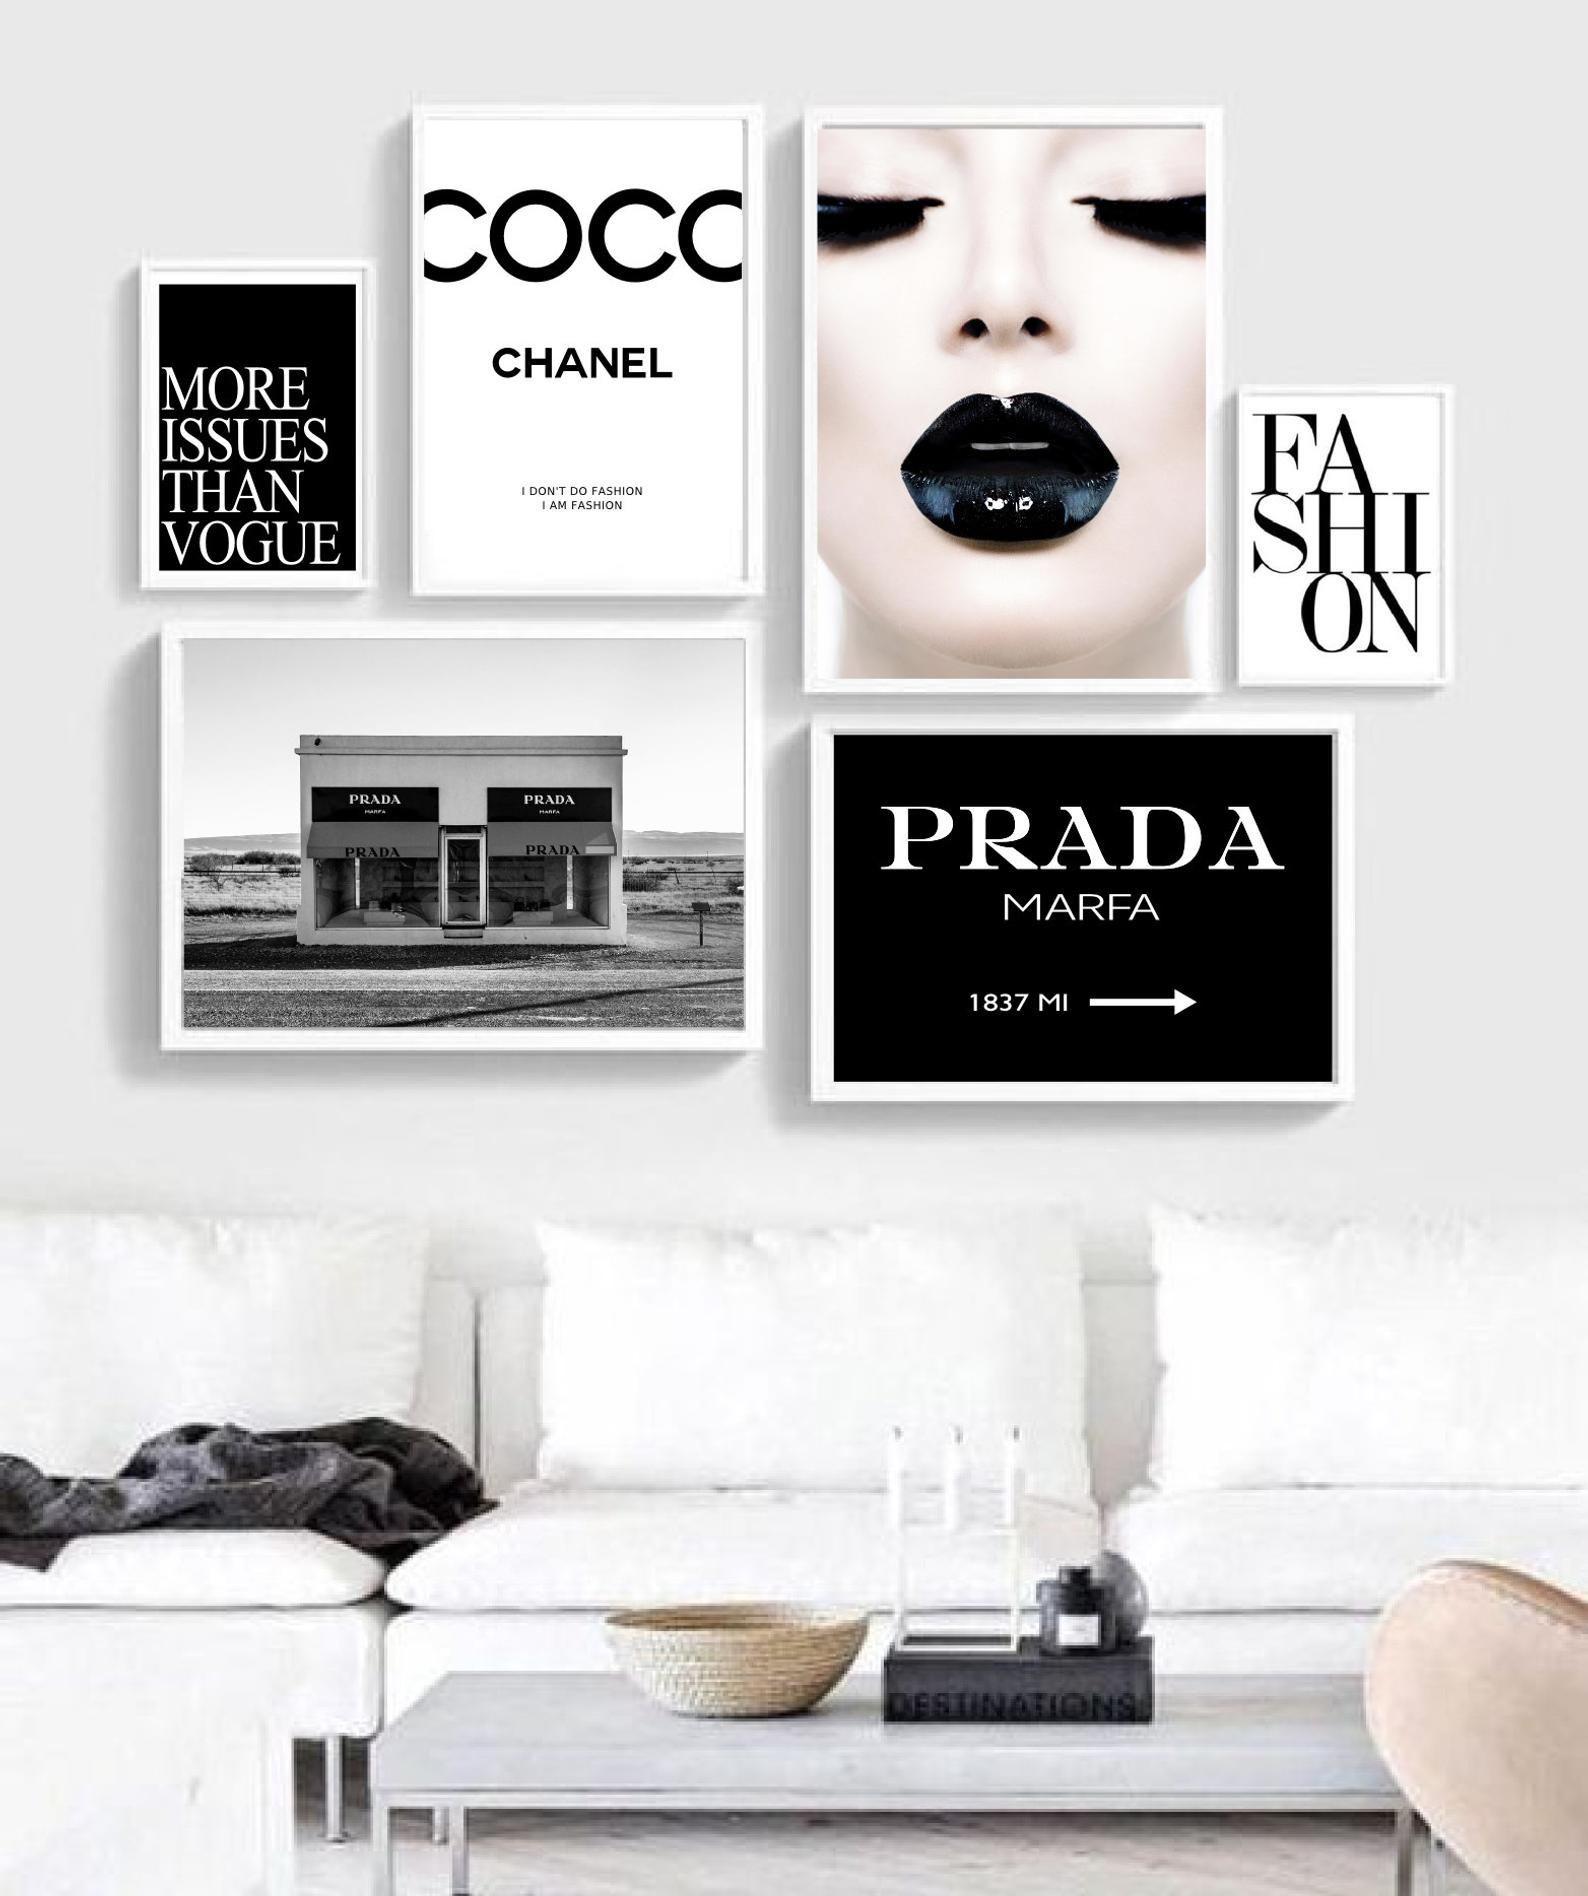 Set Of 6 Wall Art Fashion Wall Art Coco Prints Prada Wall Art Vogue Poster Fashion Print Fashion Wall Art Bedroom Decor Makeup Room Decor Chanel Room